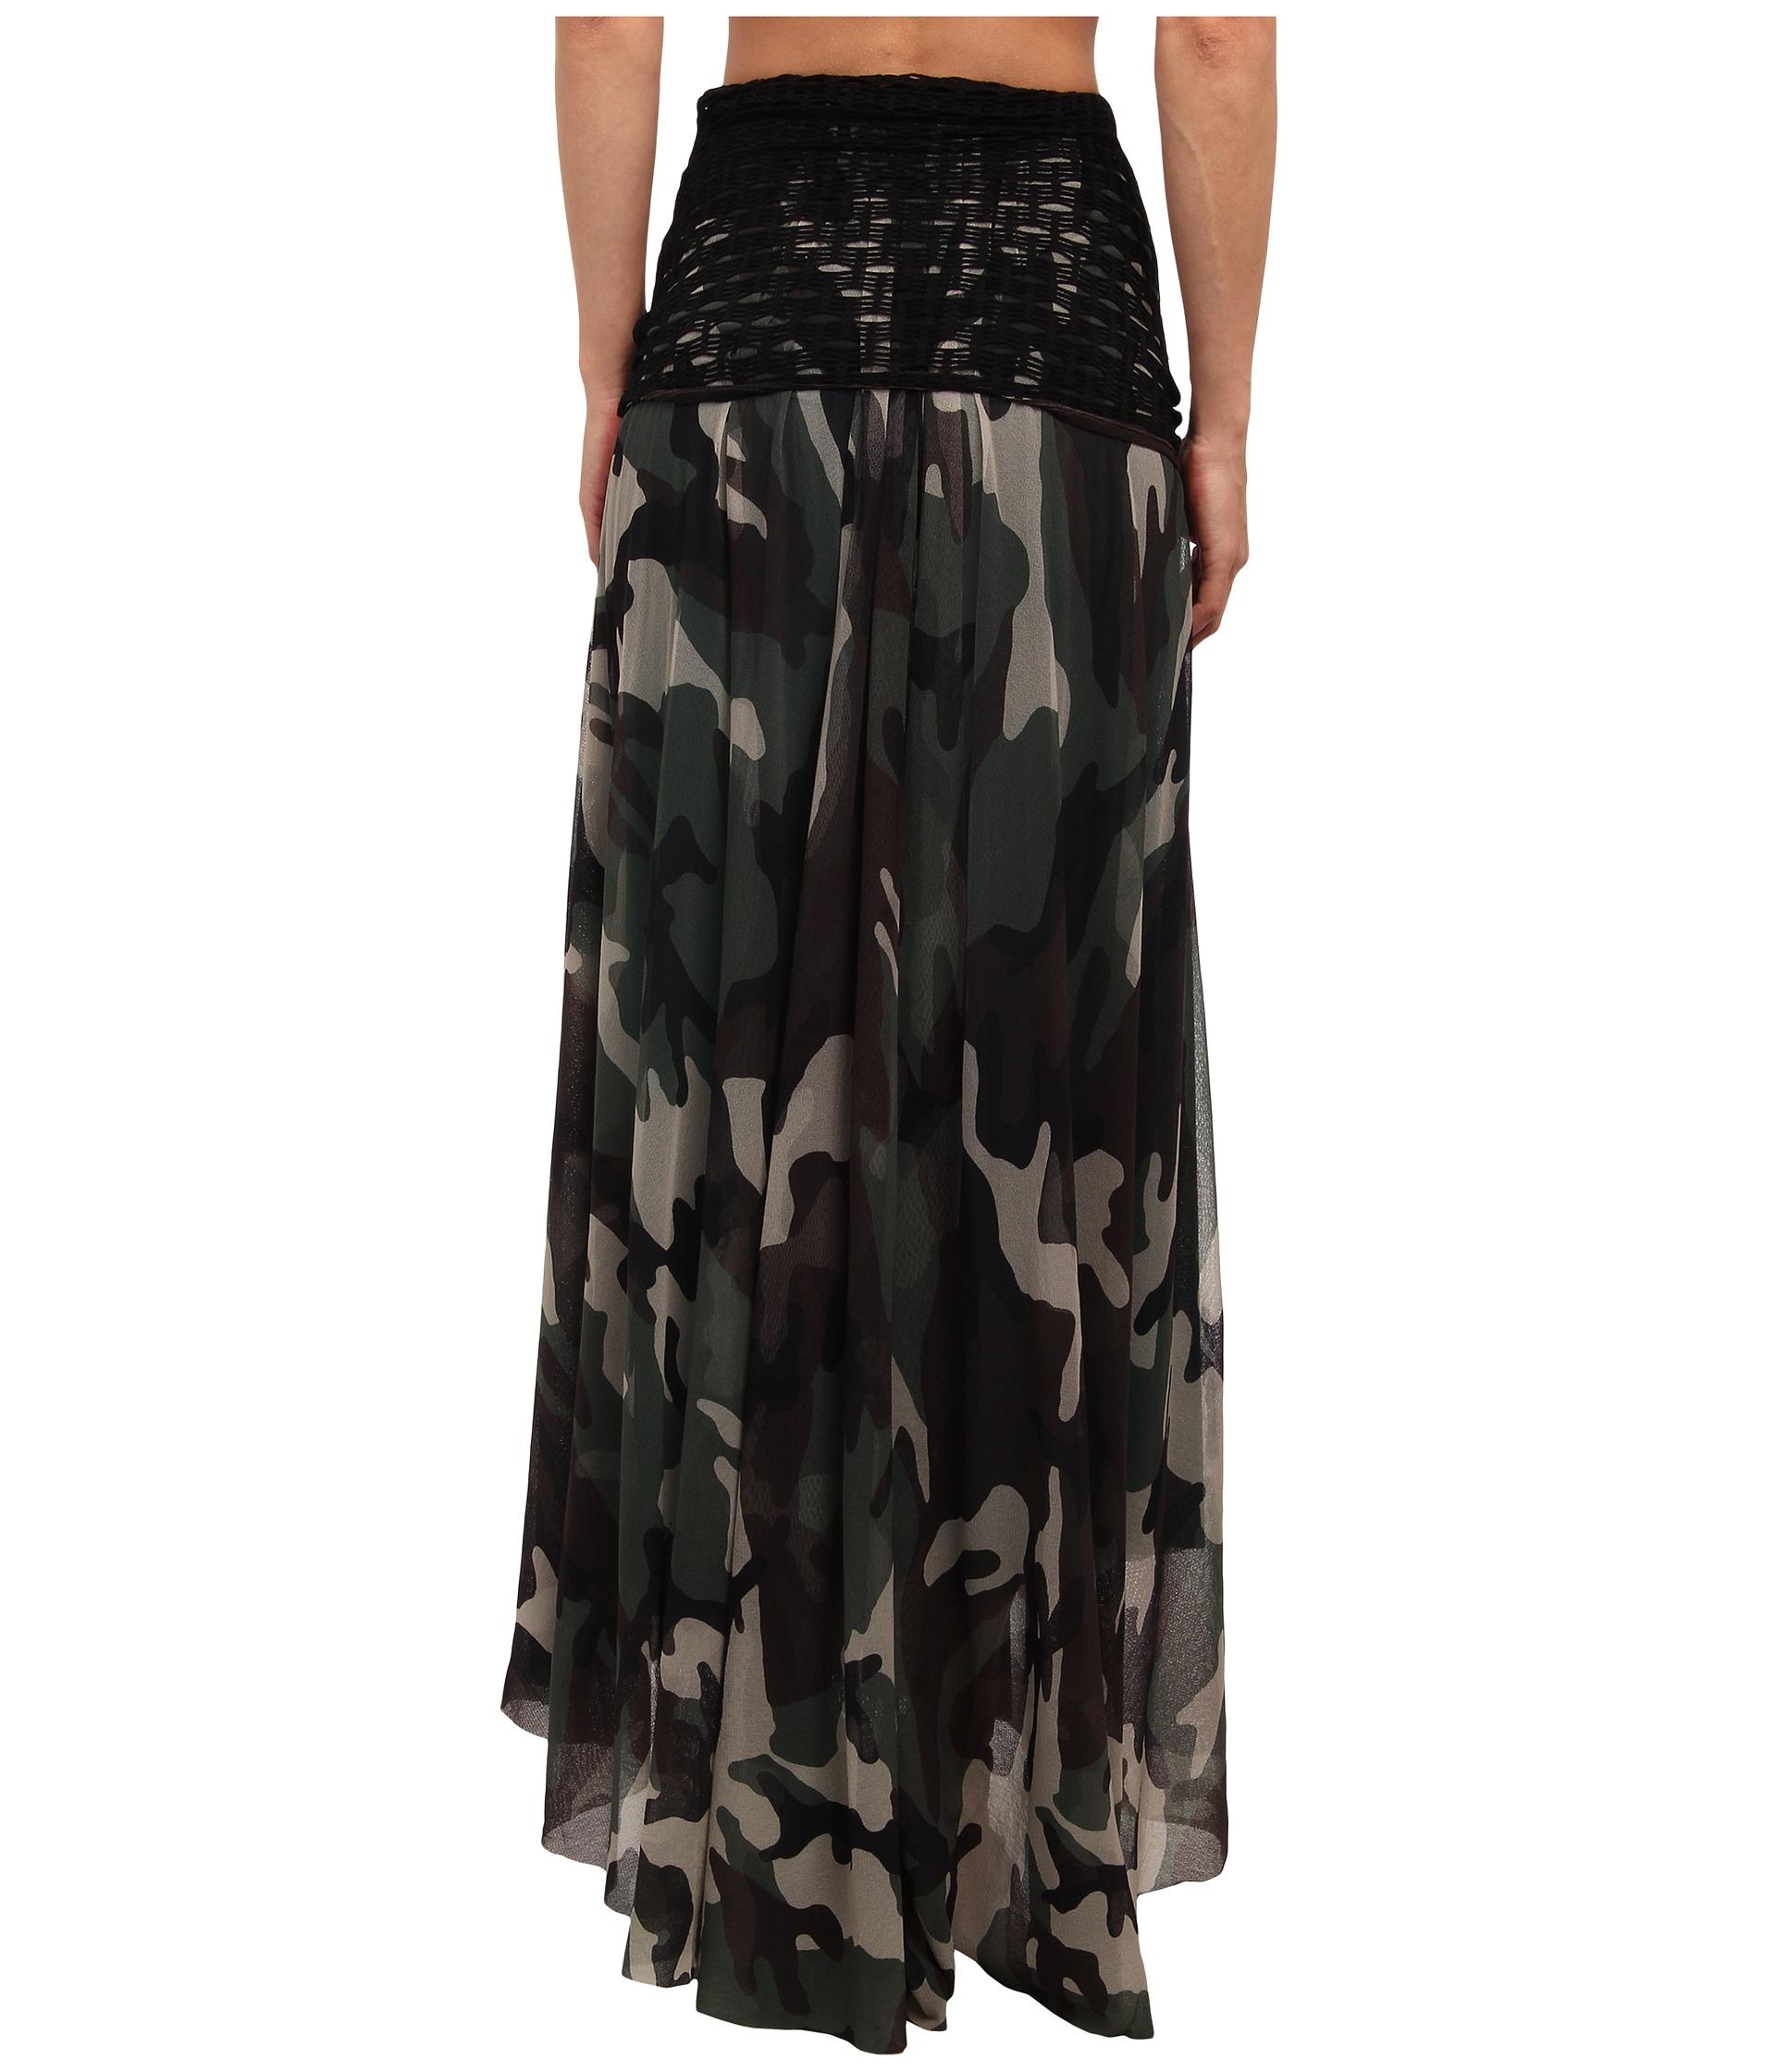 jean paul gaultier camo tulle maxi skirt w fishnet waist